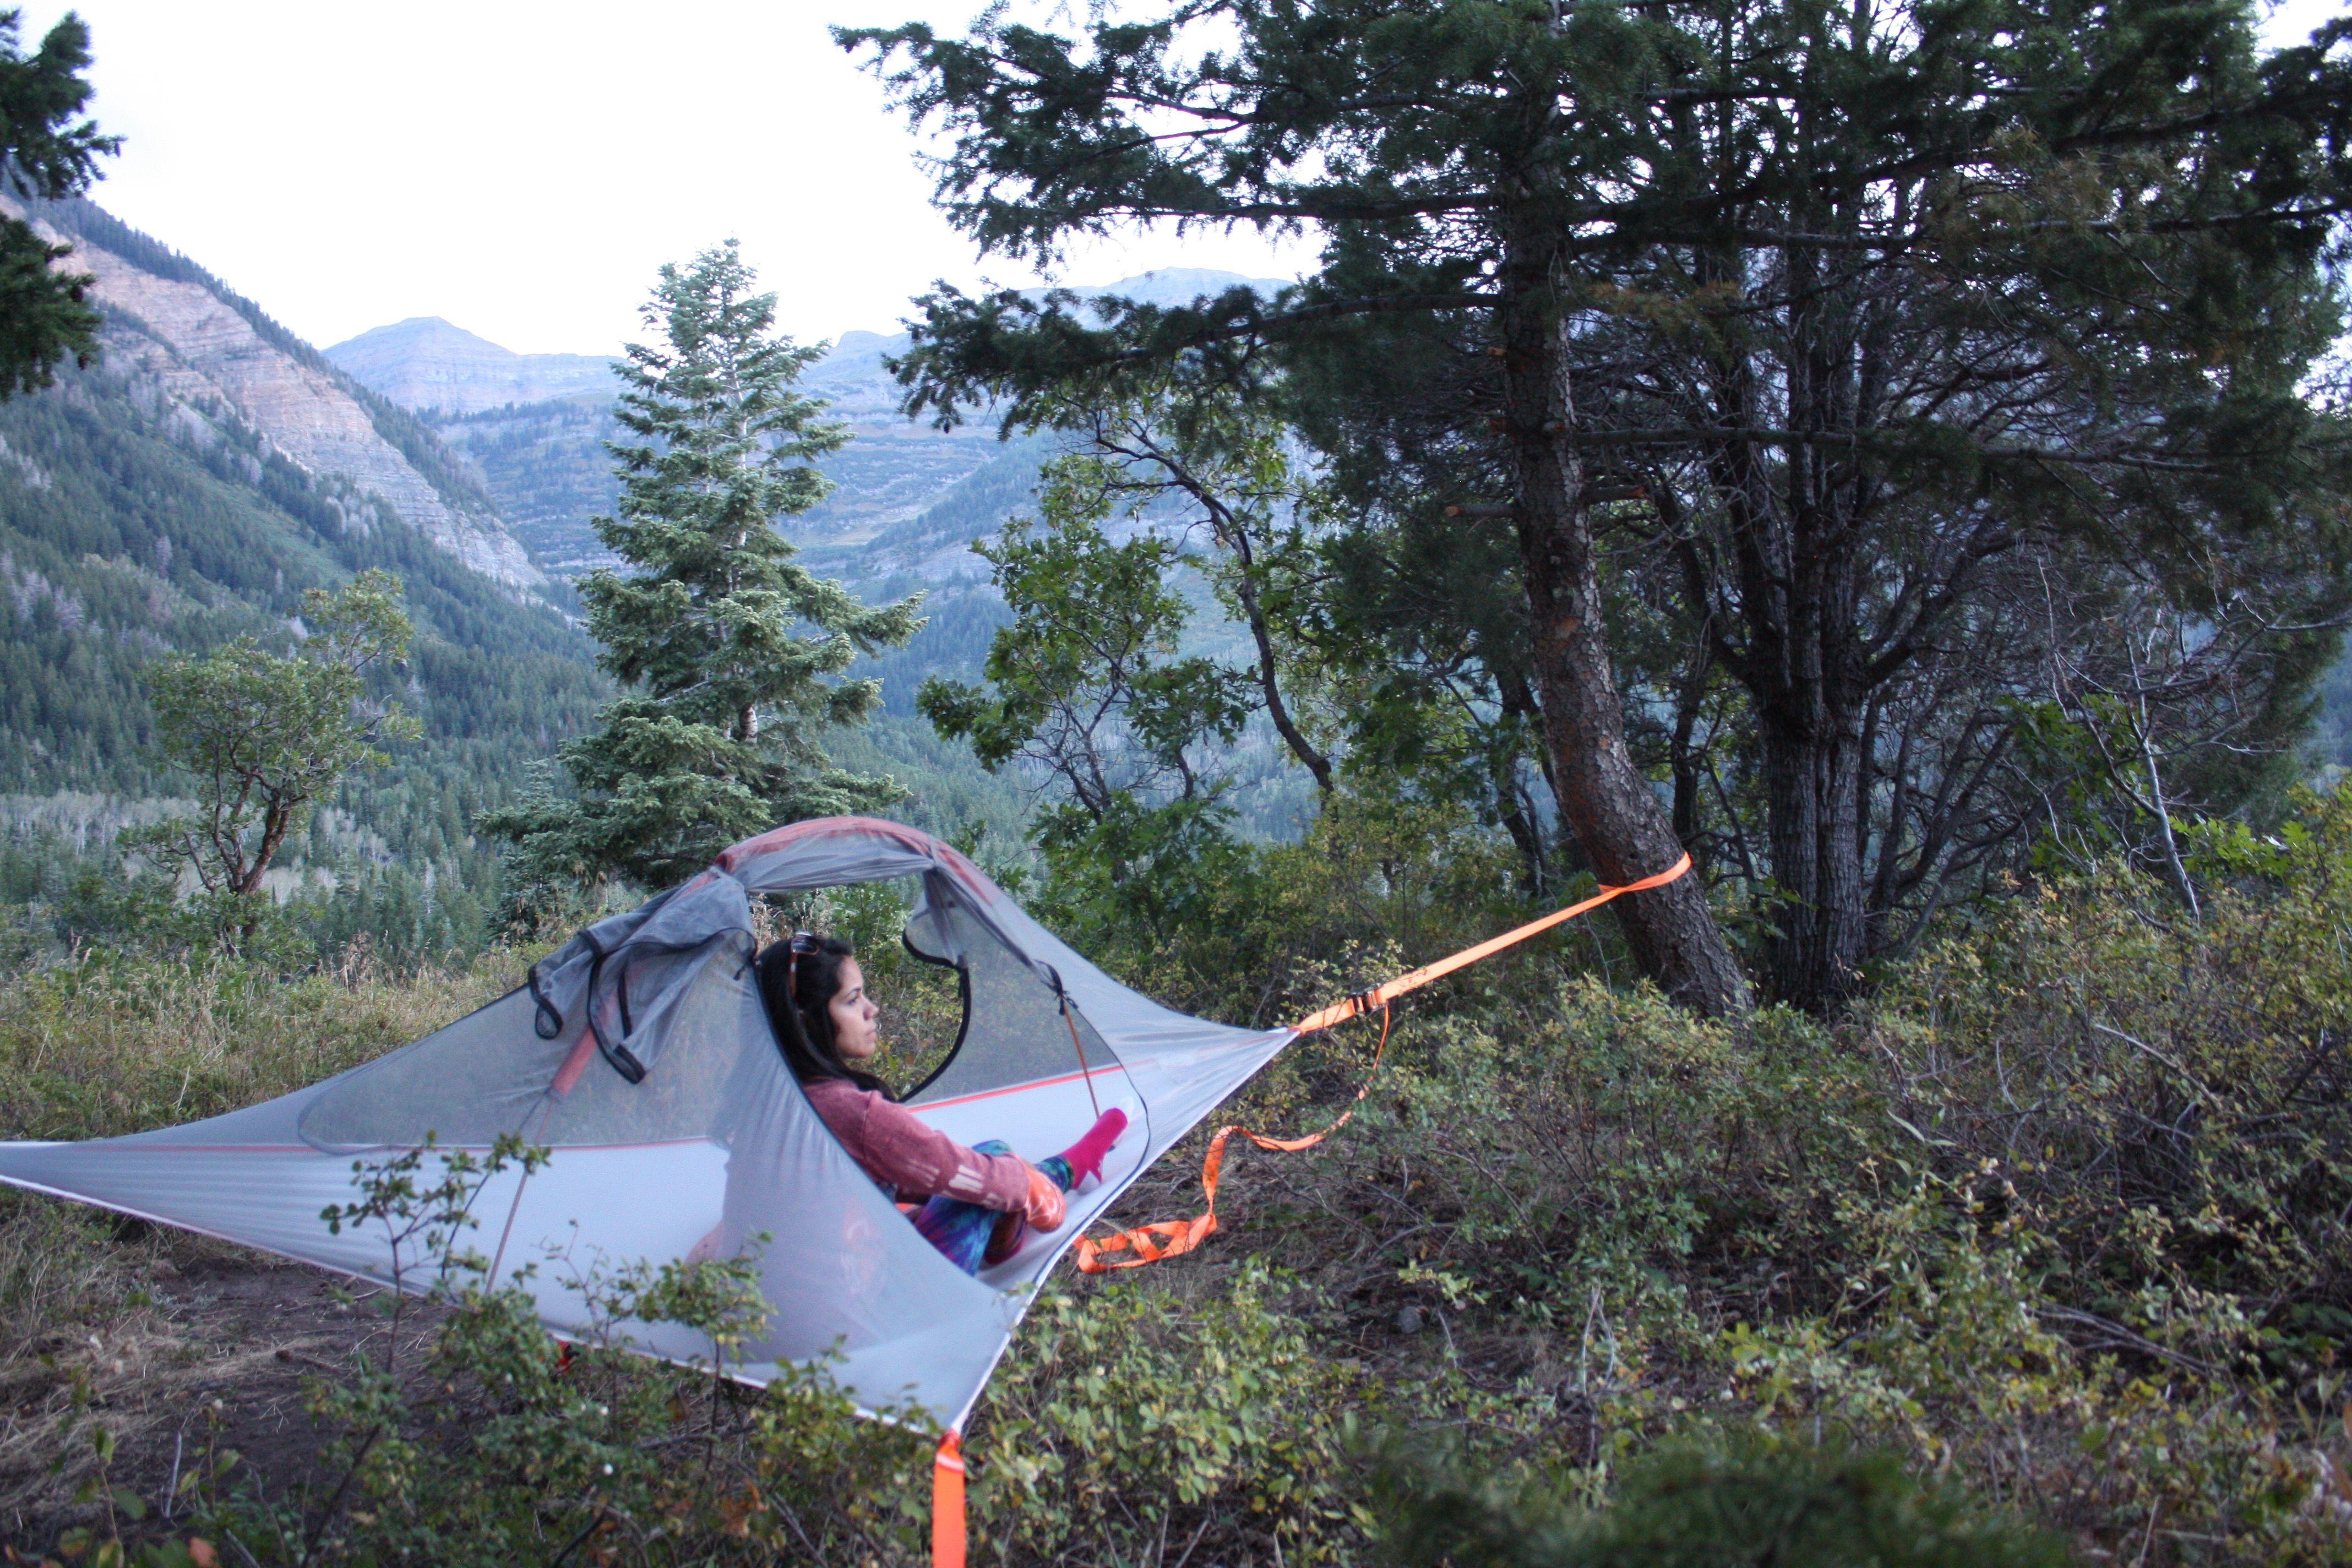 company tent tree tentsile adventure camping hammock idlewild